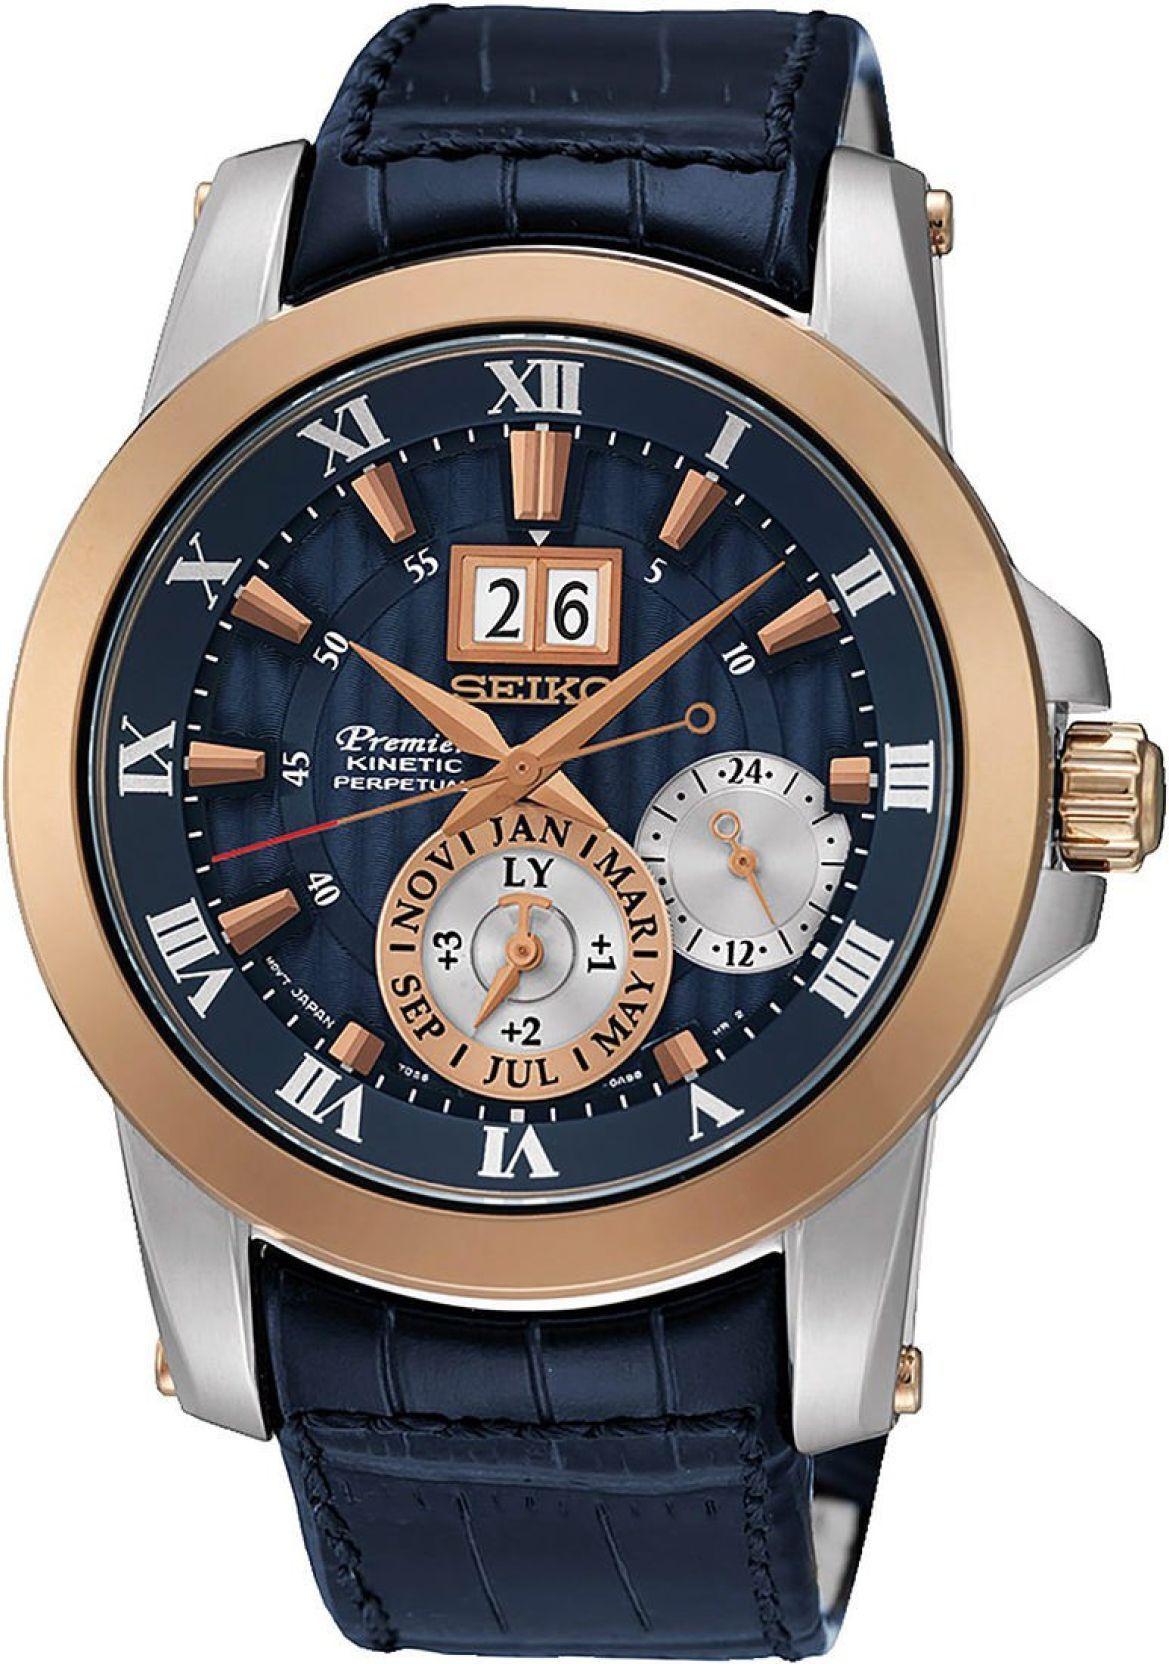 Seiko SNP126P1 Blue Premier Watch For Men